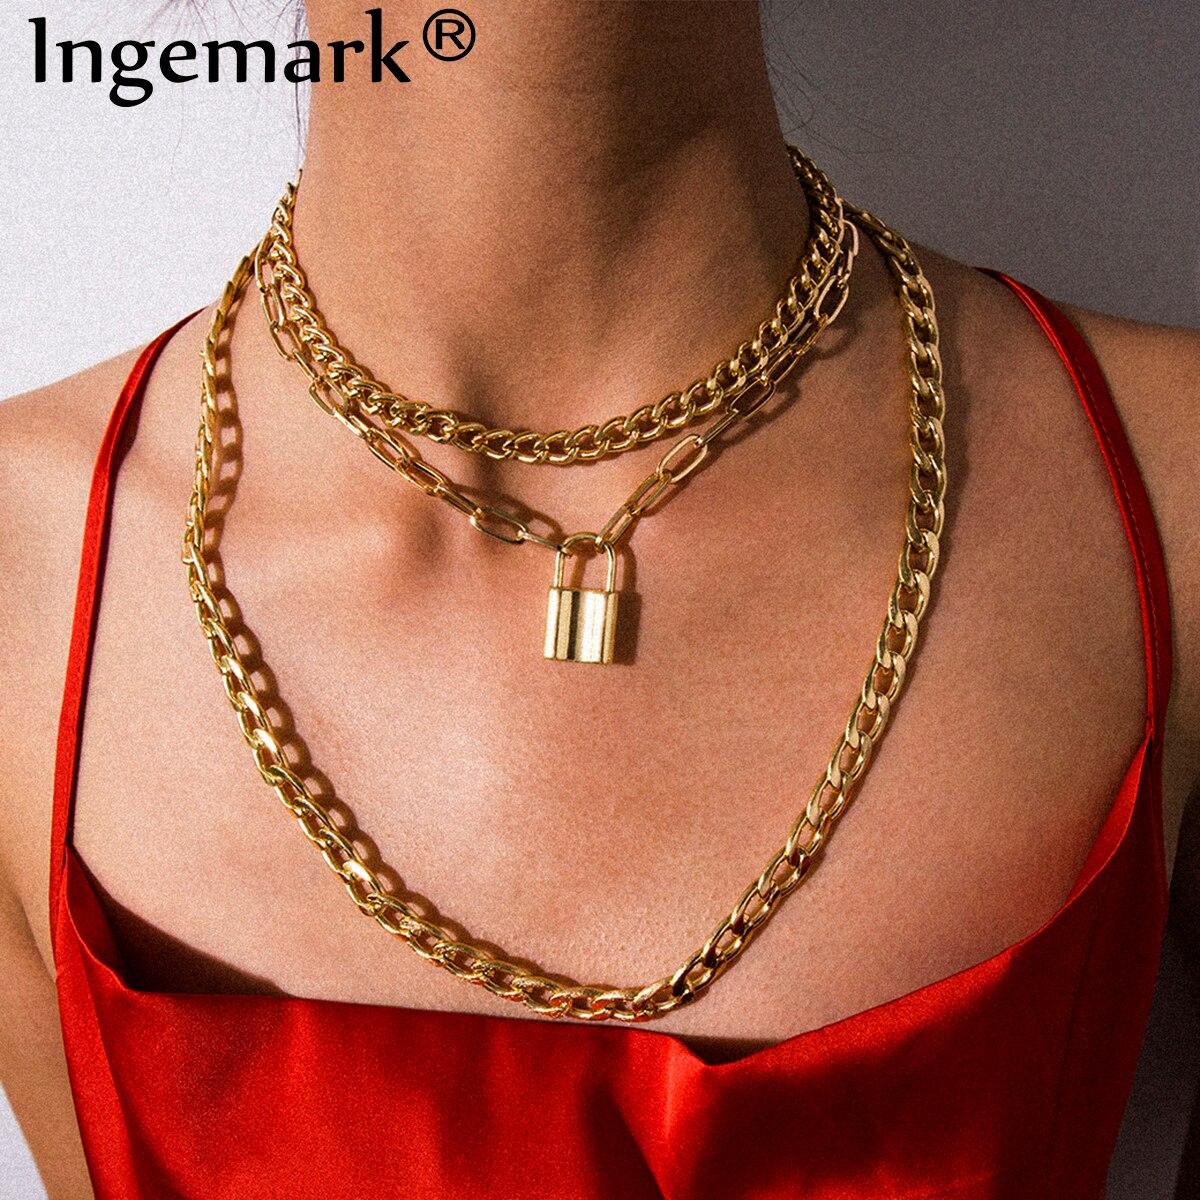 Punk Cuban Big Chunky Chain Necklace Collar Statement Multi Layer Lock Padlock Pendant Choker Necklace Steampunk Couple Jewelry